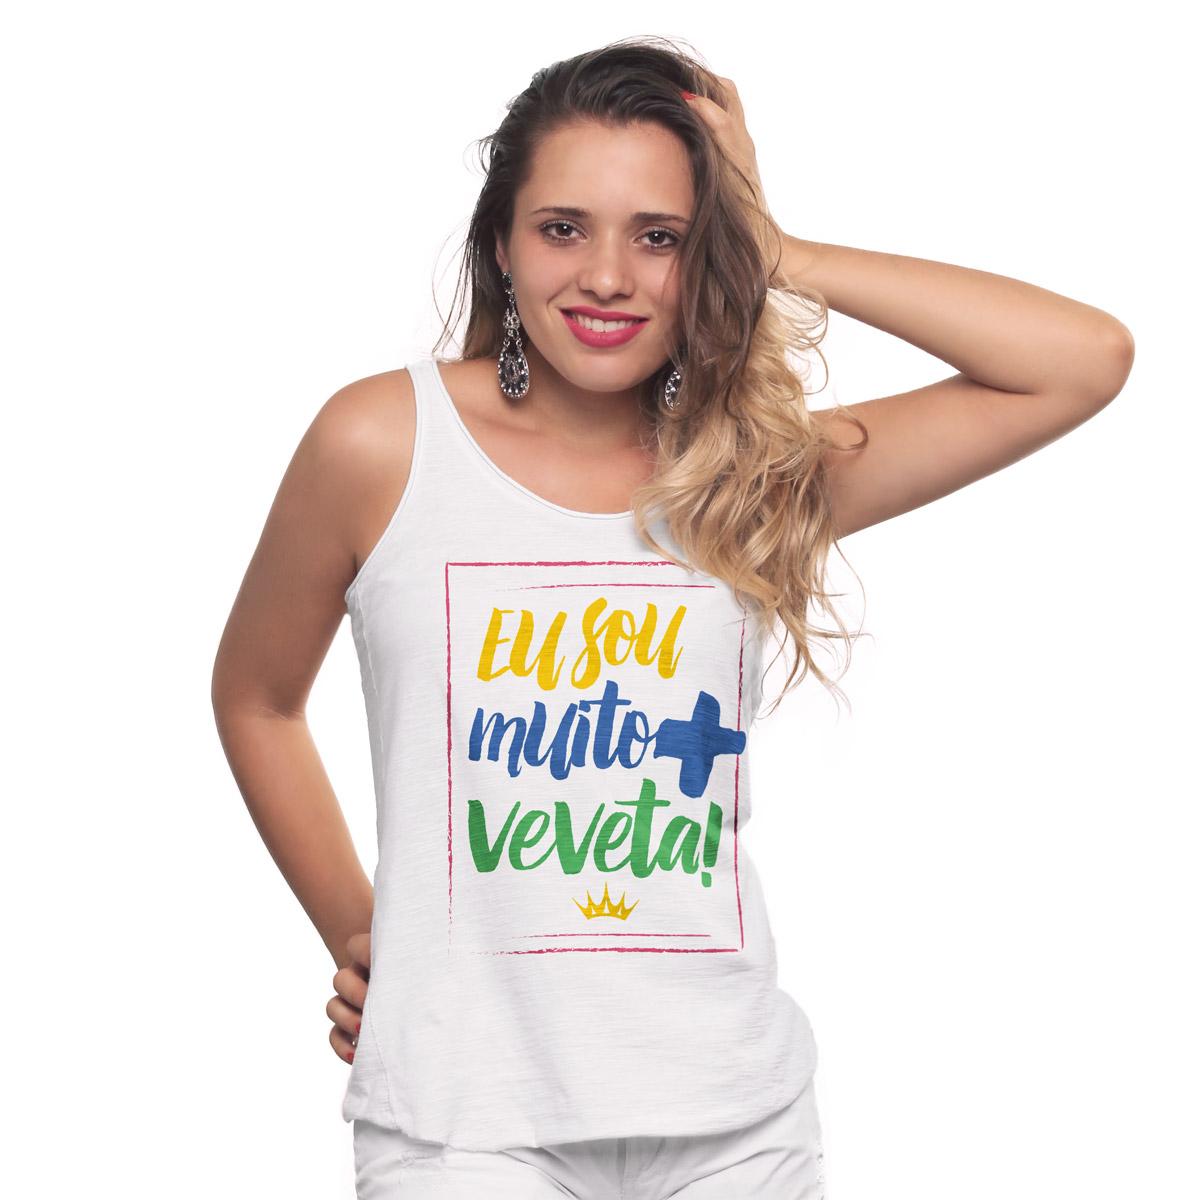 Regata Premium Feminina Ivete Sangalo Eu Sou Muito + Veveta